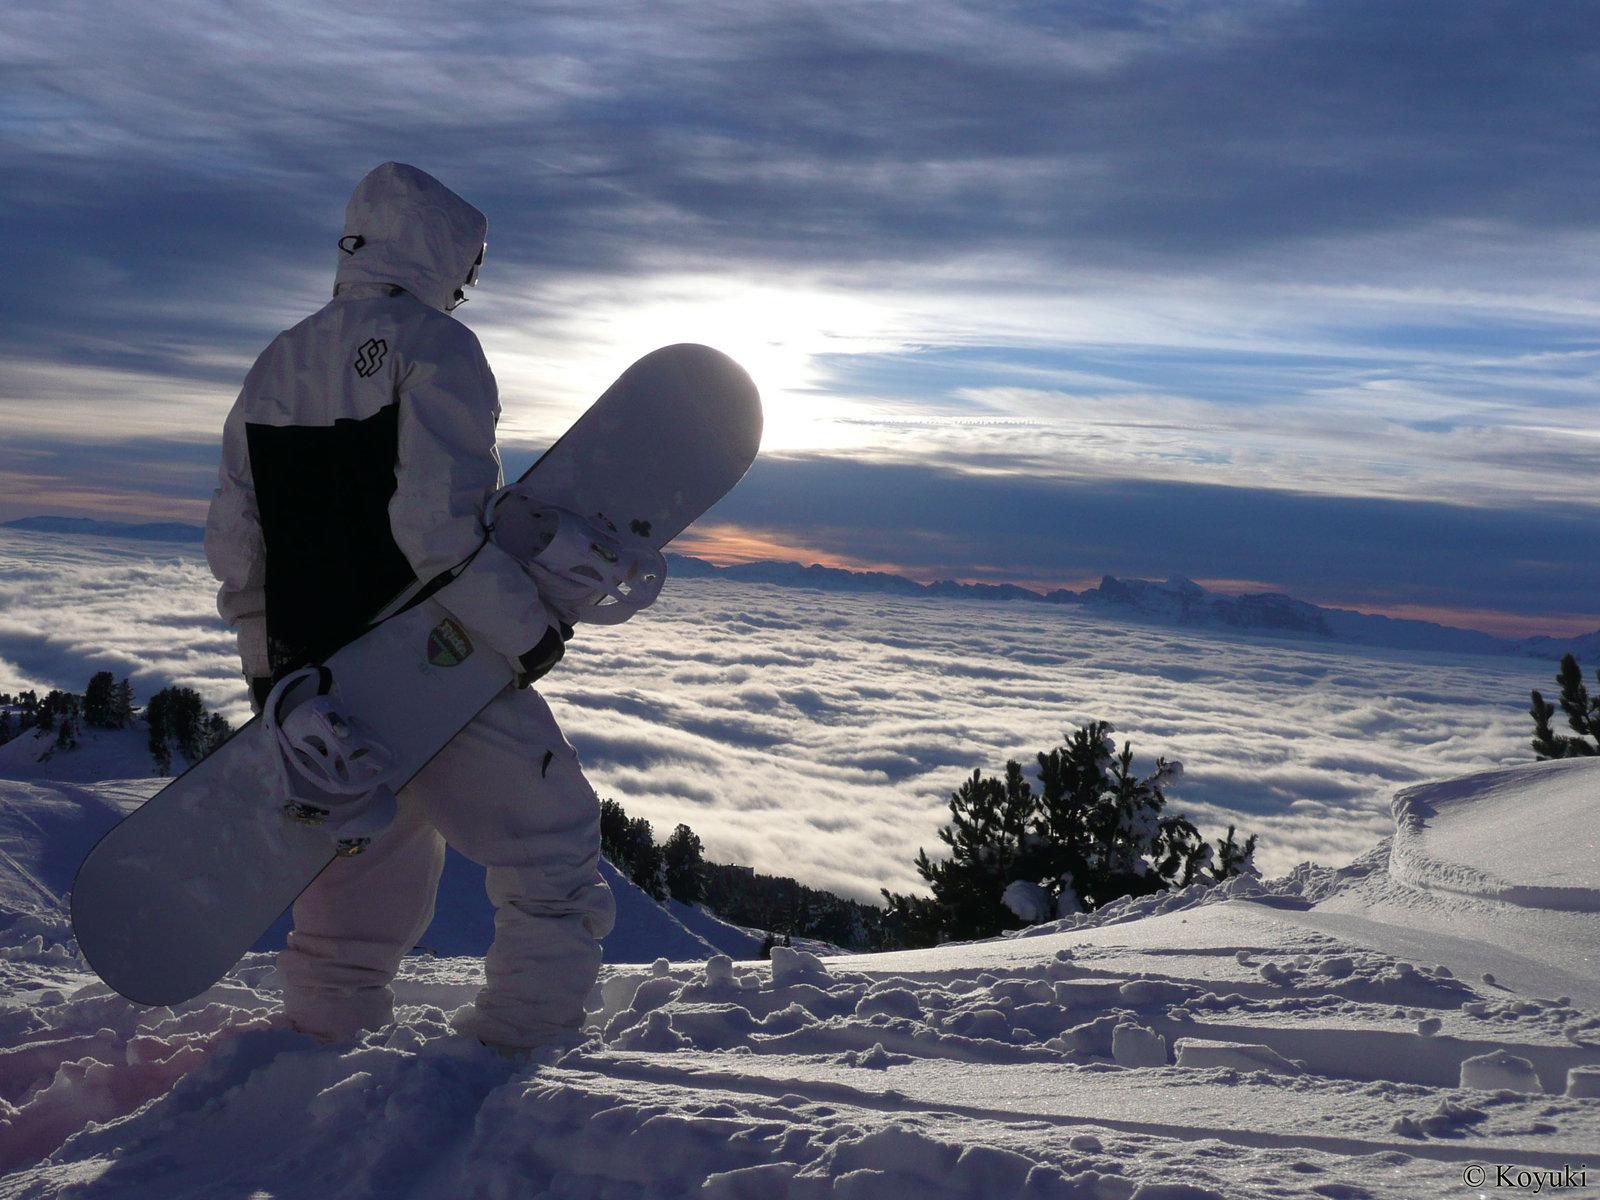 snowboarding-wallpaper-11